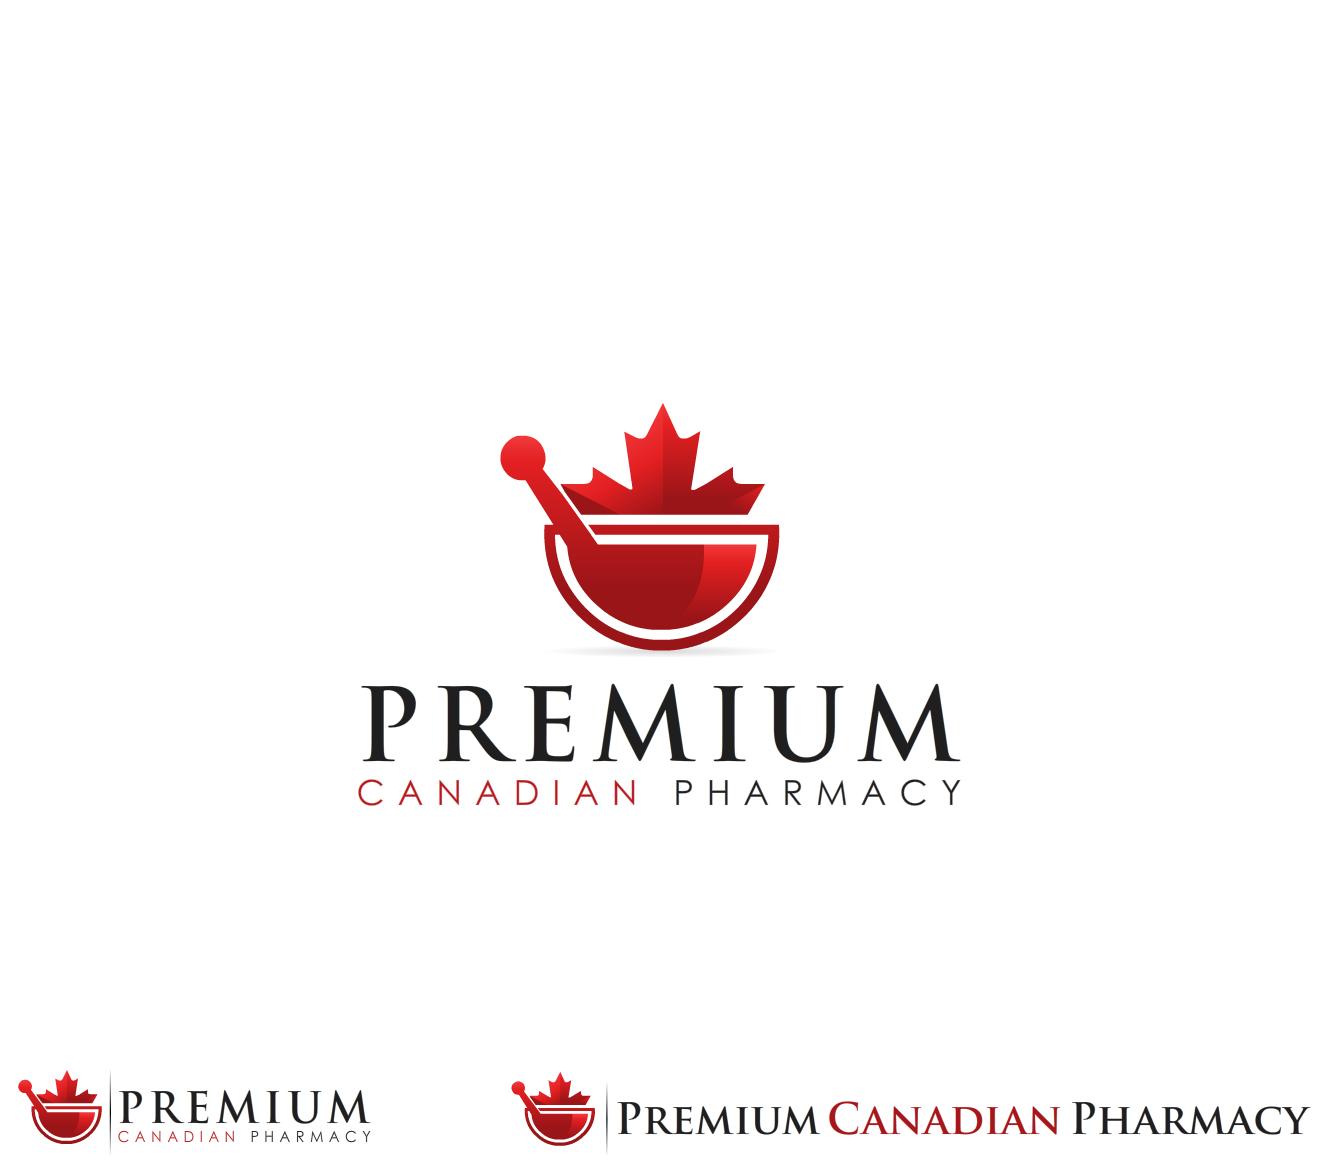 Premium Canadian Pharmacy needs a new logo